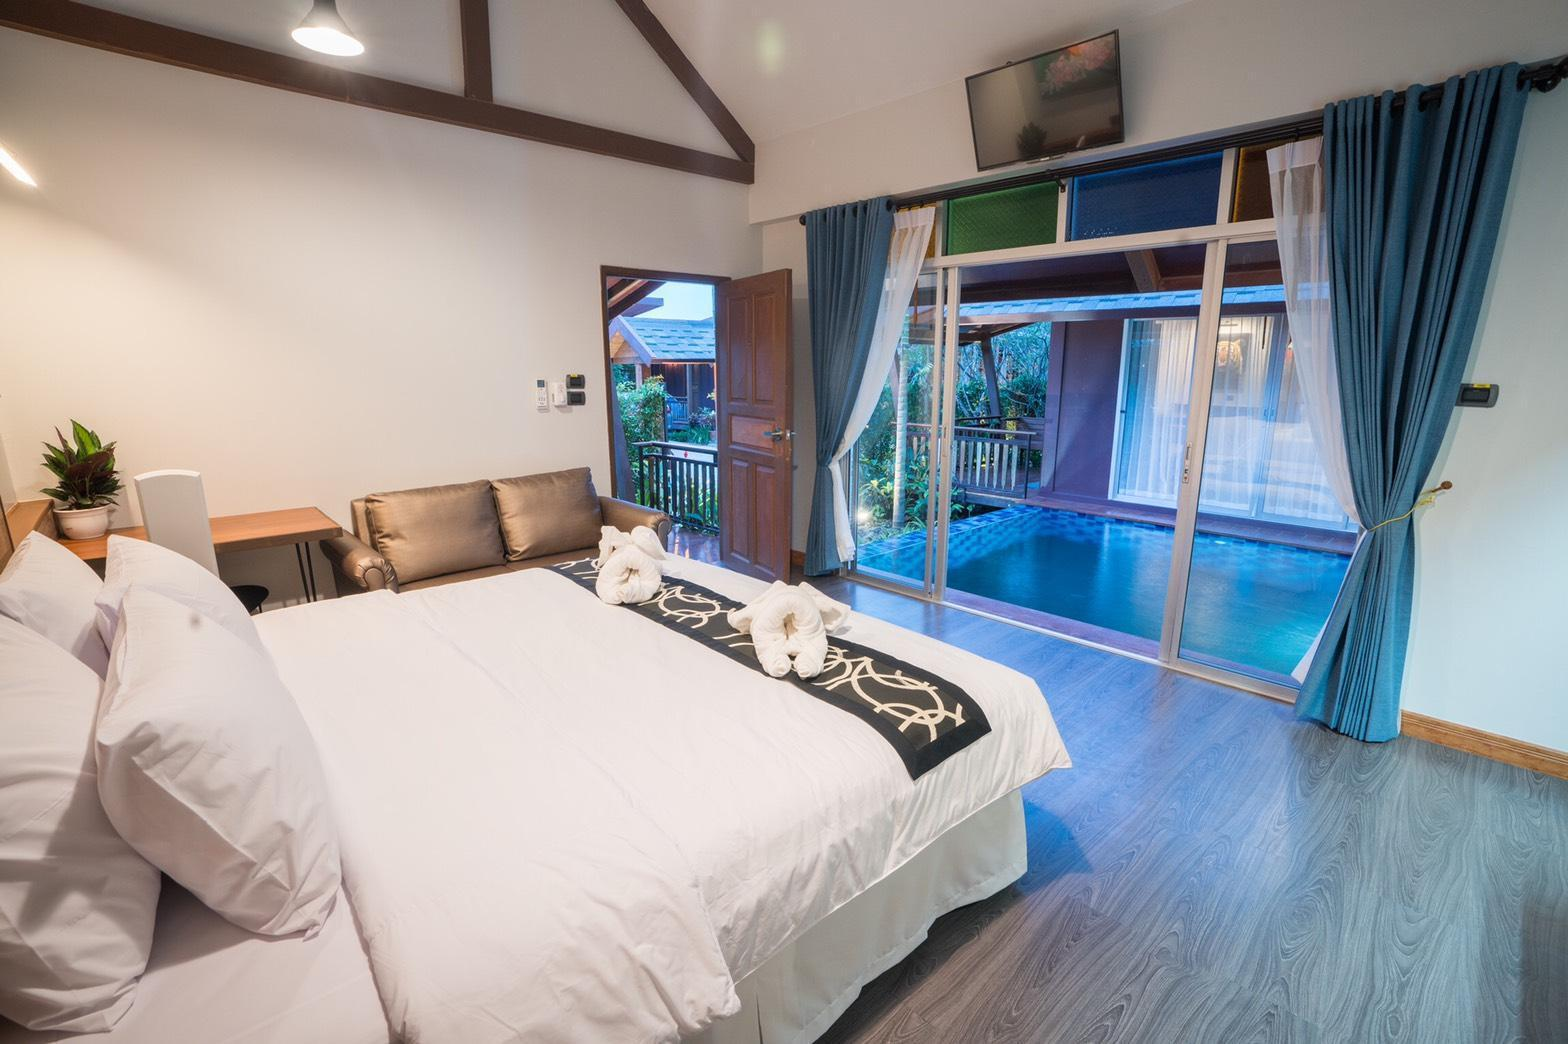 The Cinnamon Resort Pattaya